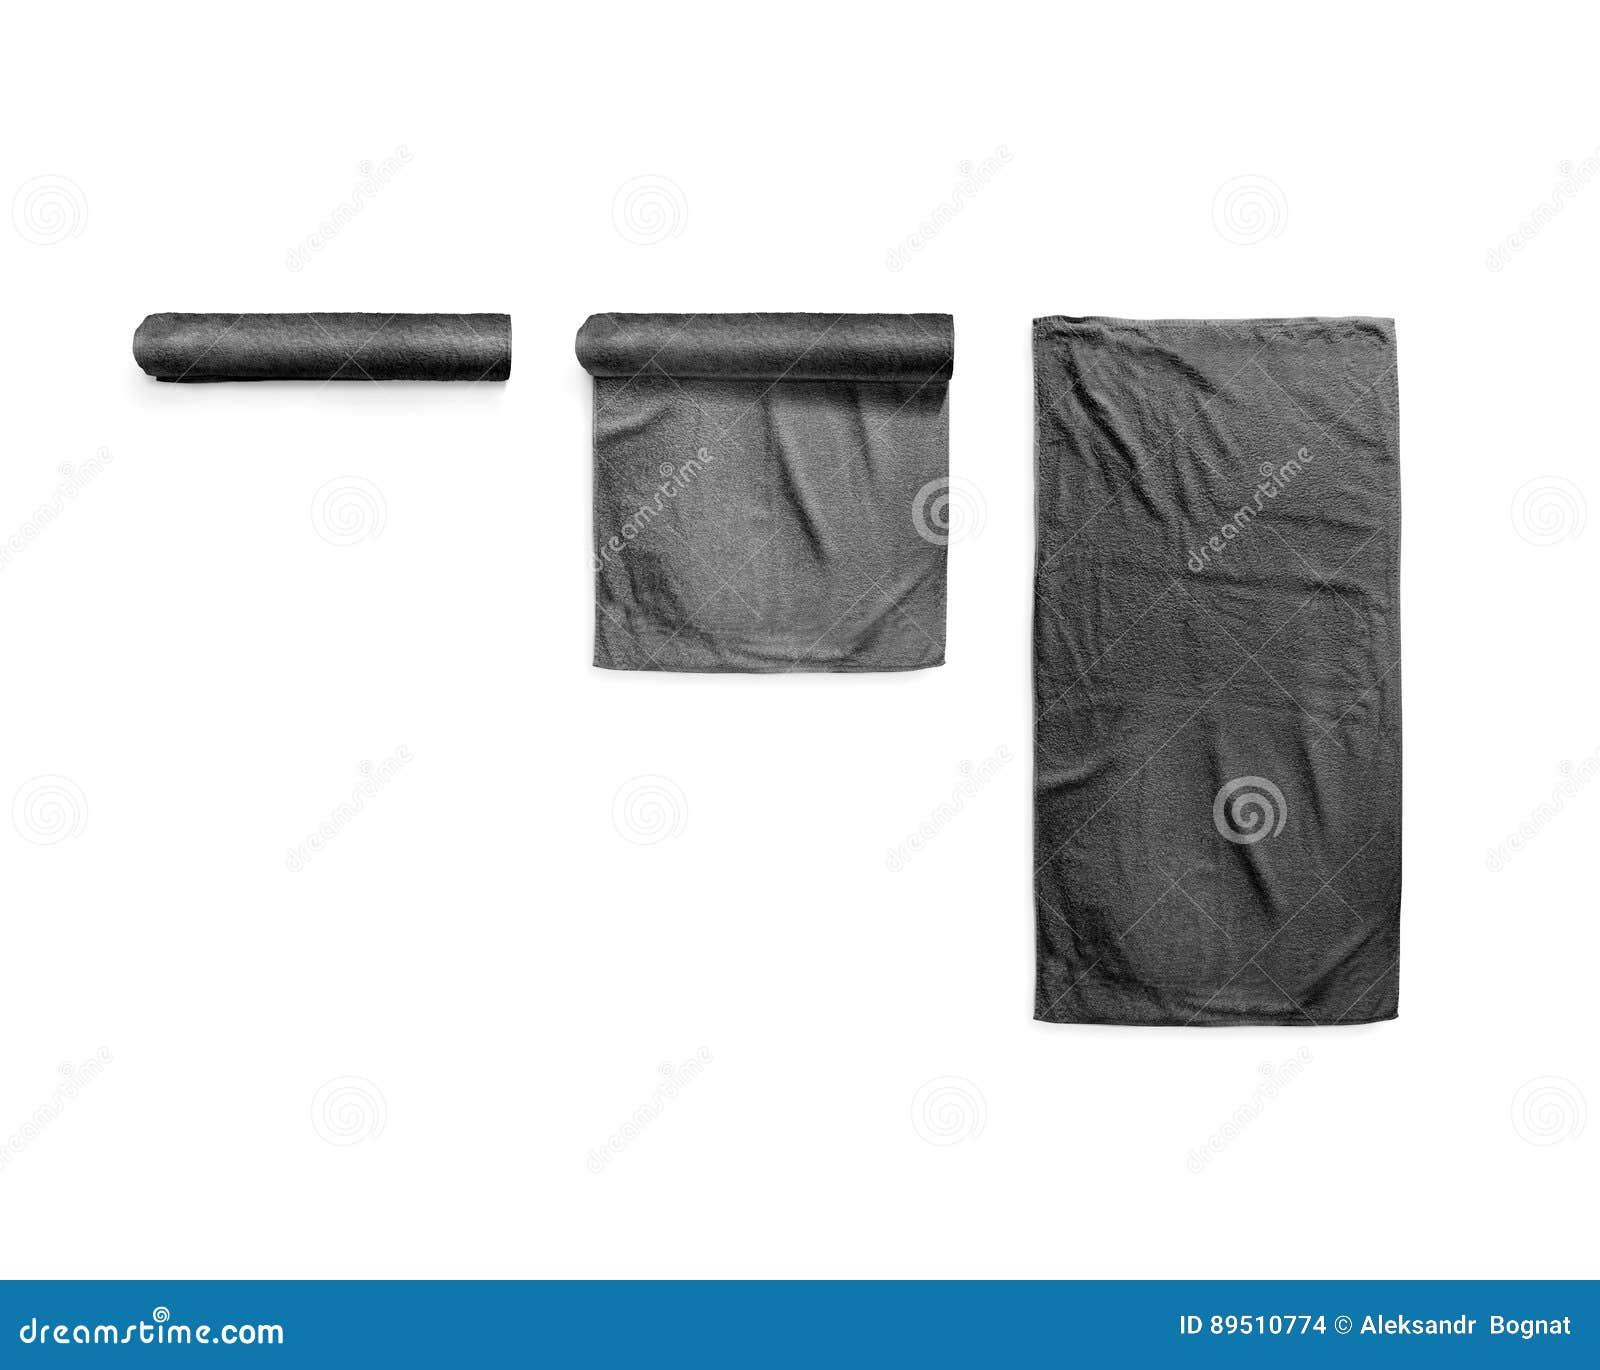 blank white beach towel. Black Black Soft Beach Towel Mockup Set Blank White S